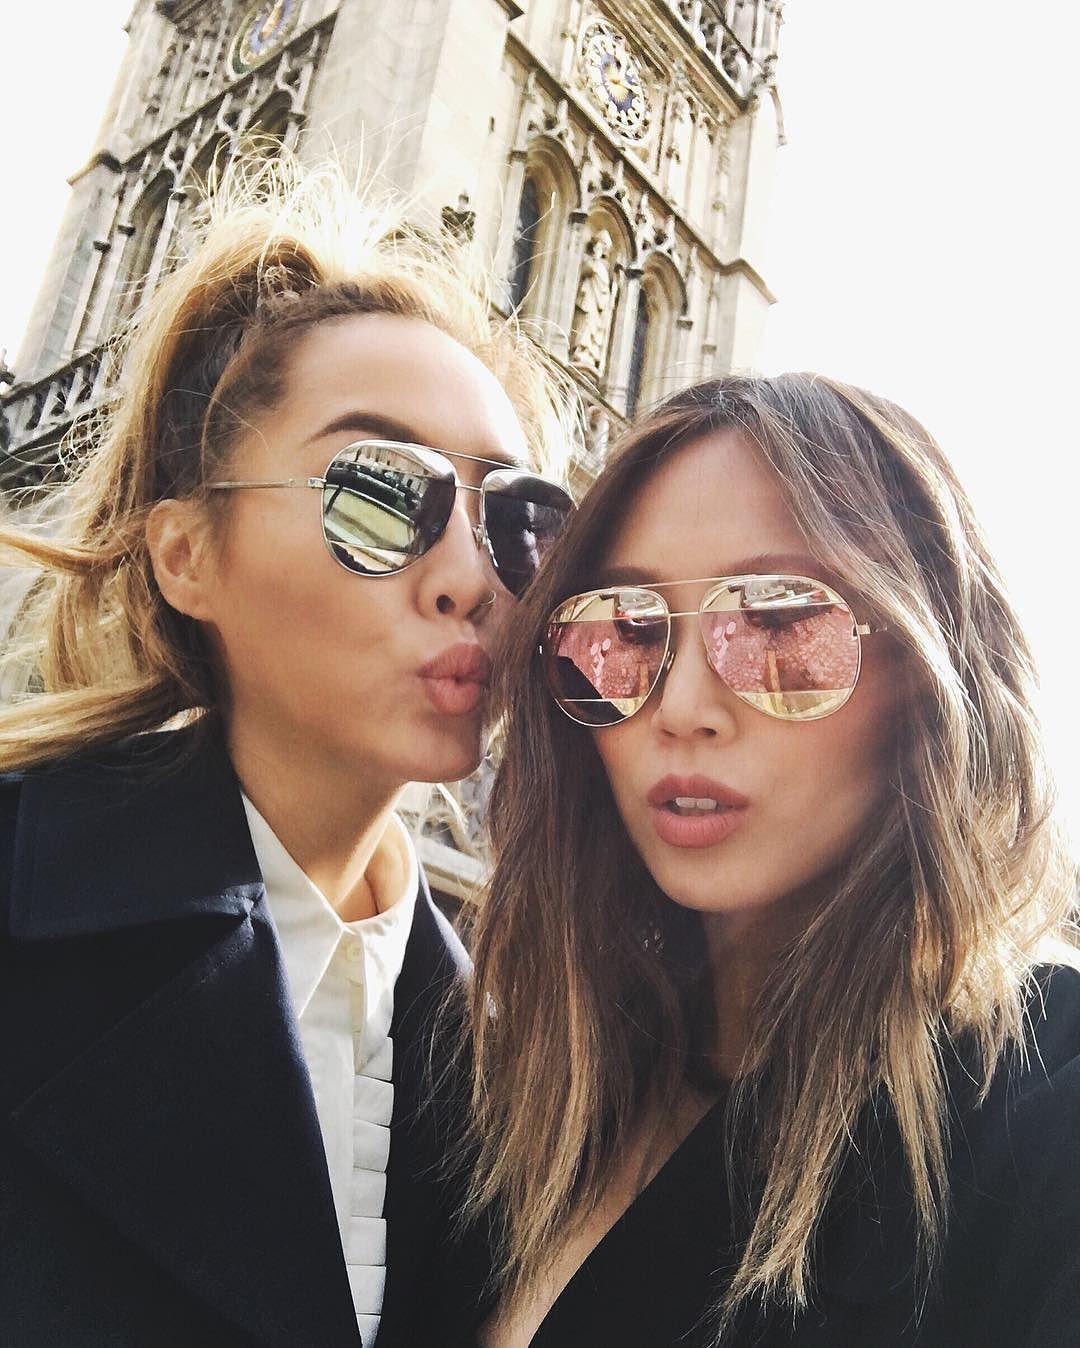 efa5460a761 Dior Split Aviator Sunglasses we ship worldwide ♥ follow us on instagram   optiekdominiek  optiekdominiek